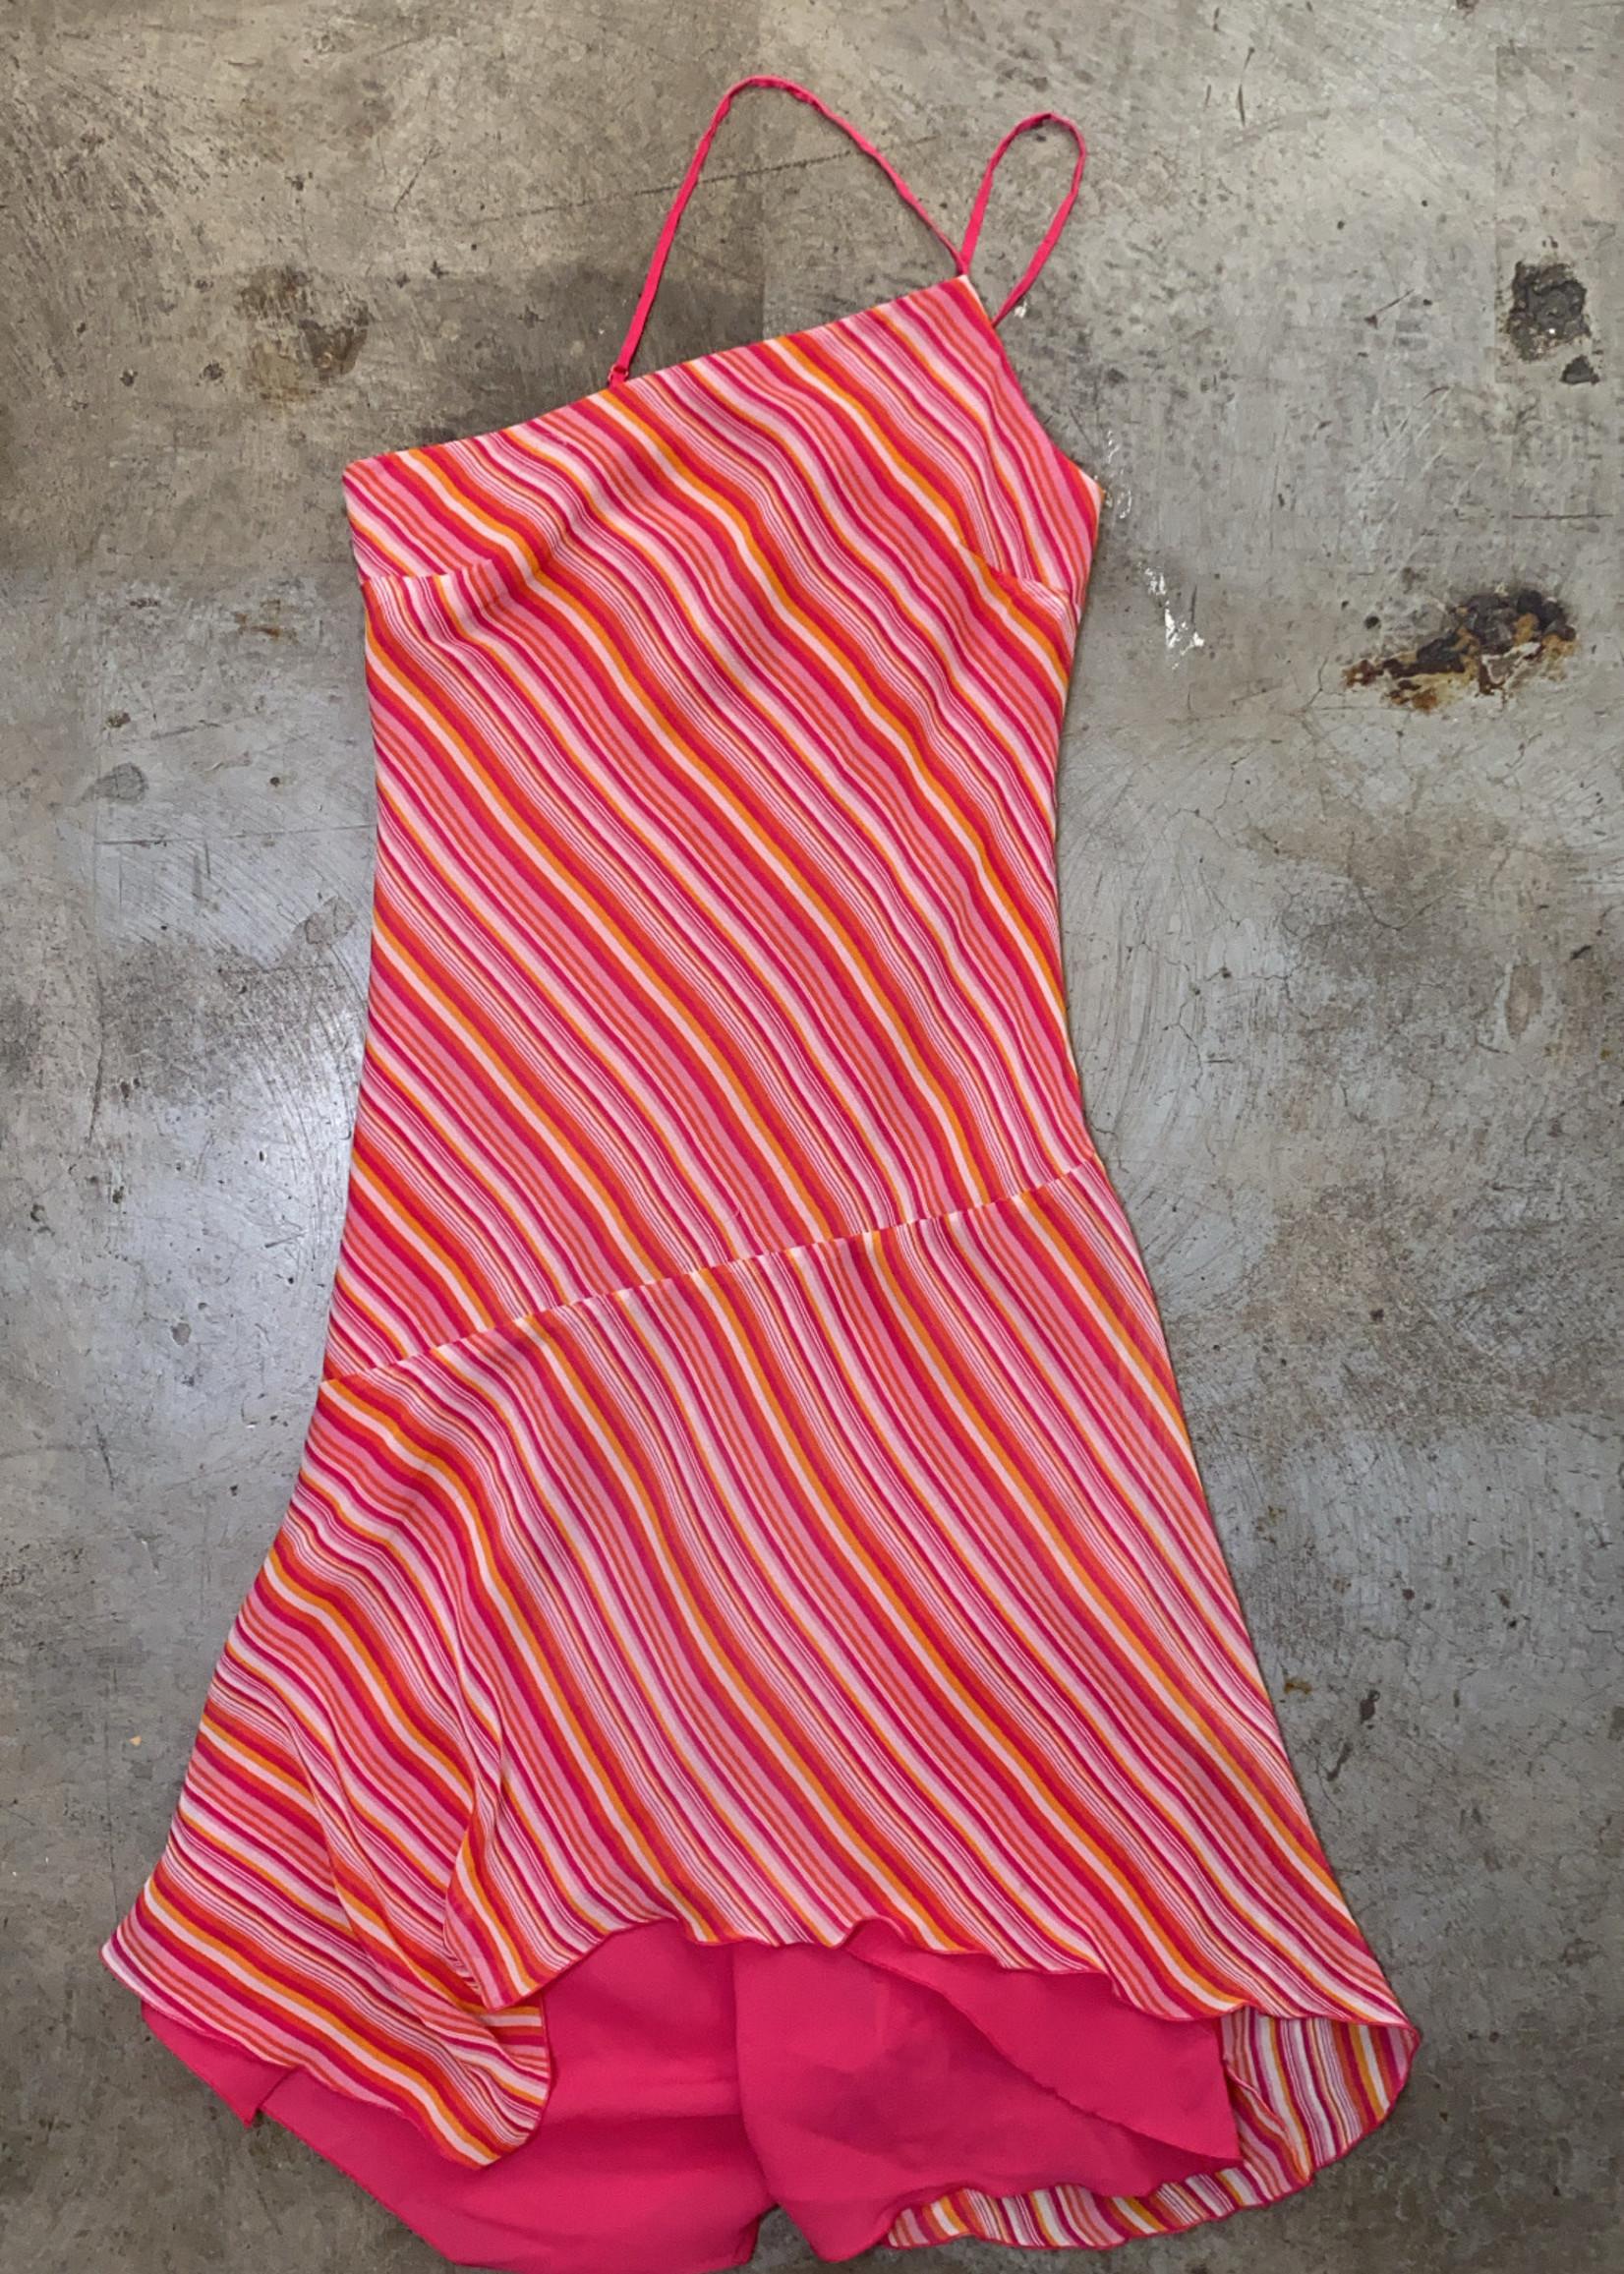 Express Y2K Hot Pink Silk Dress 6/M